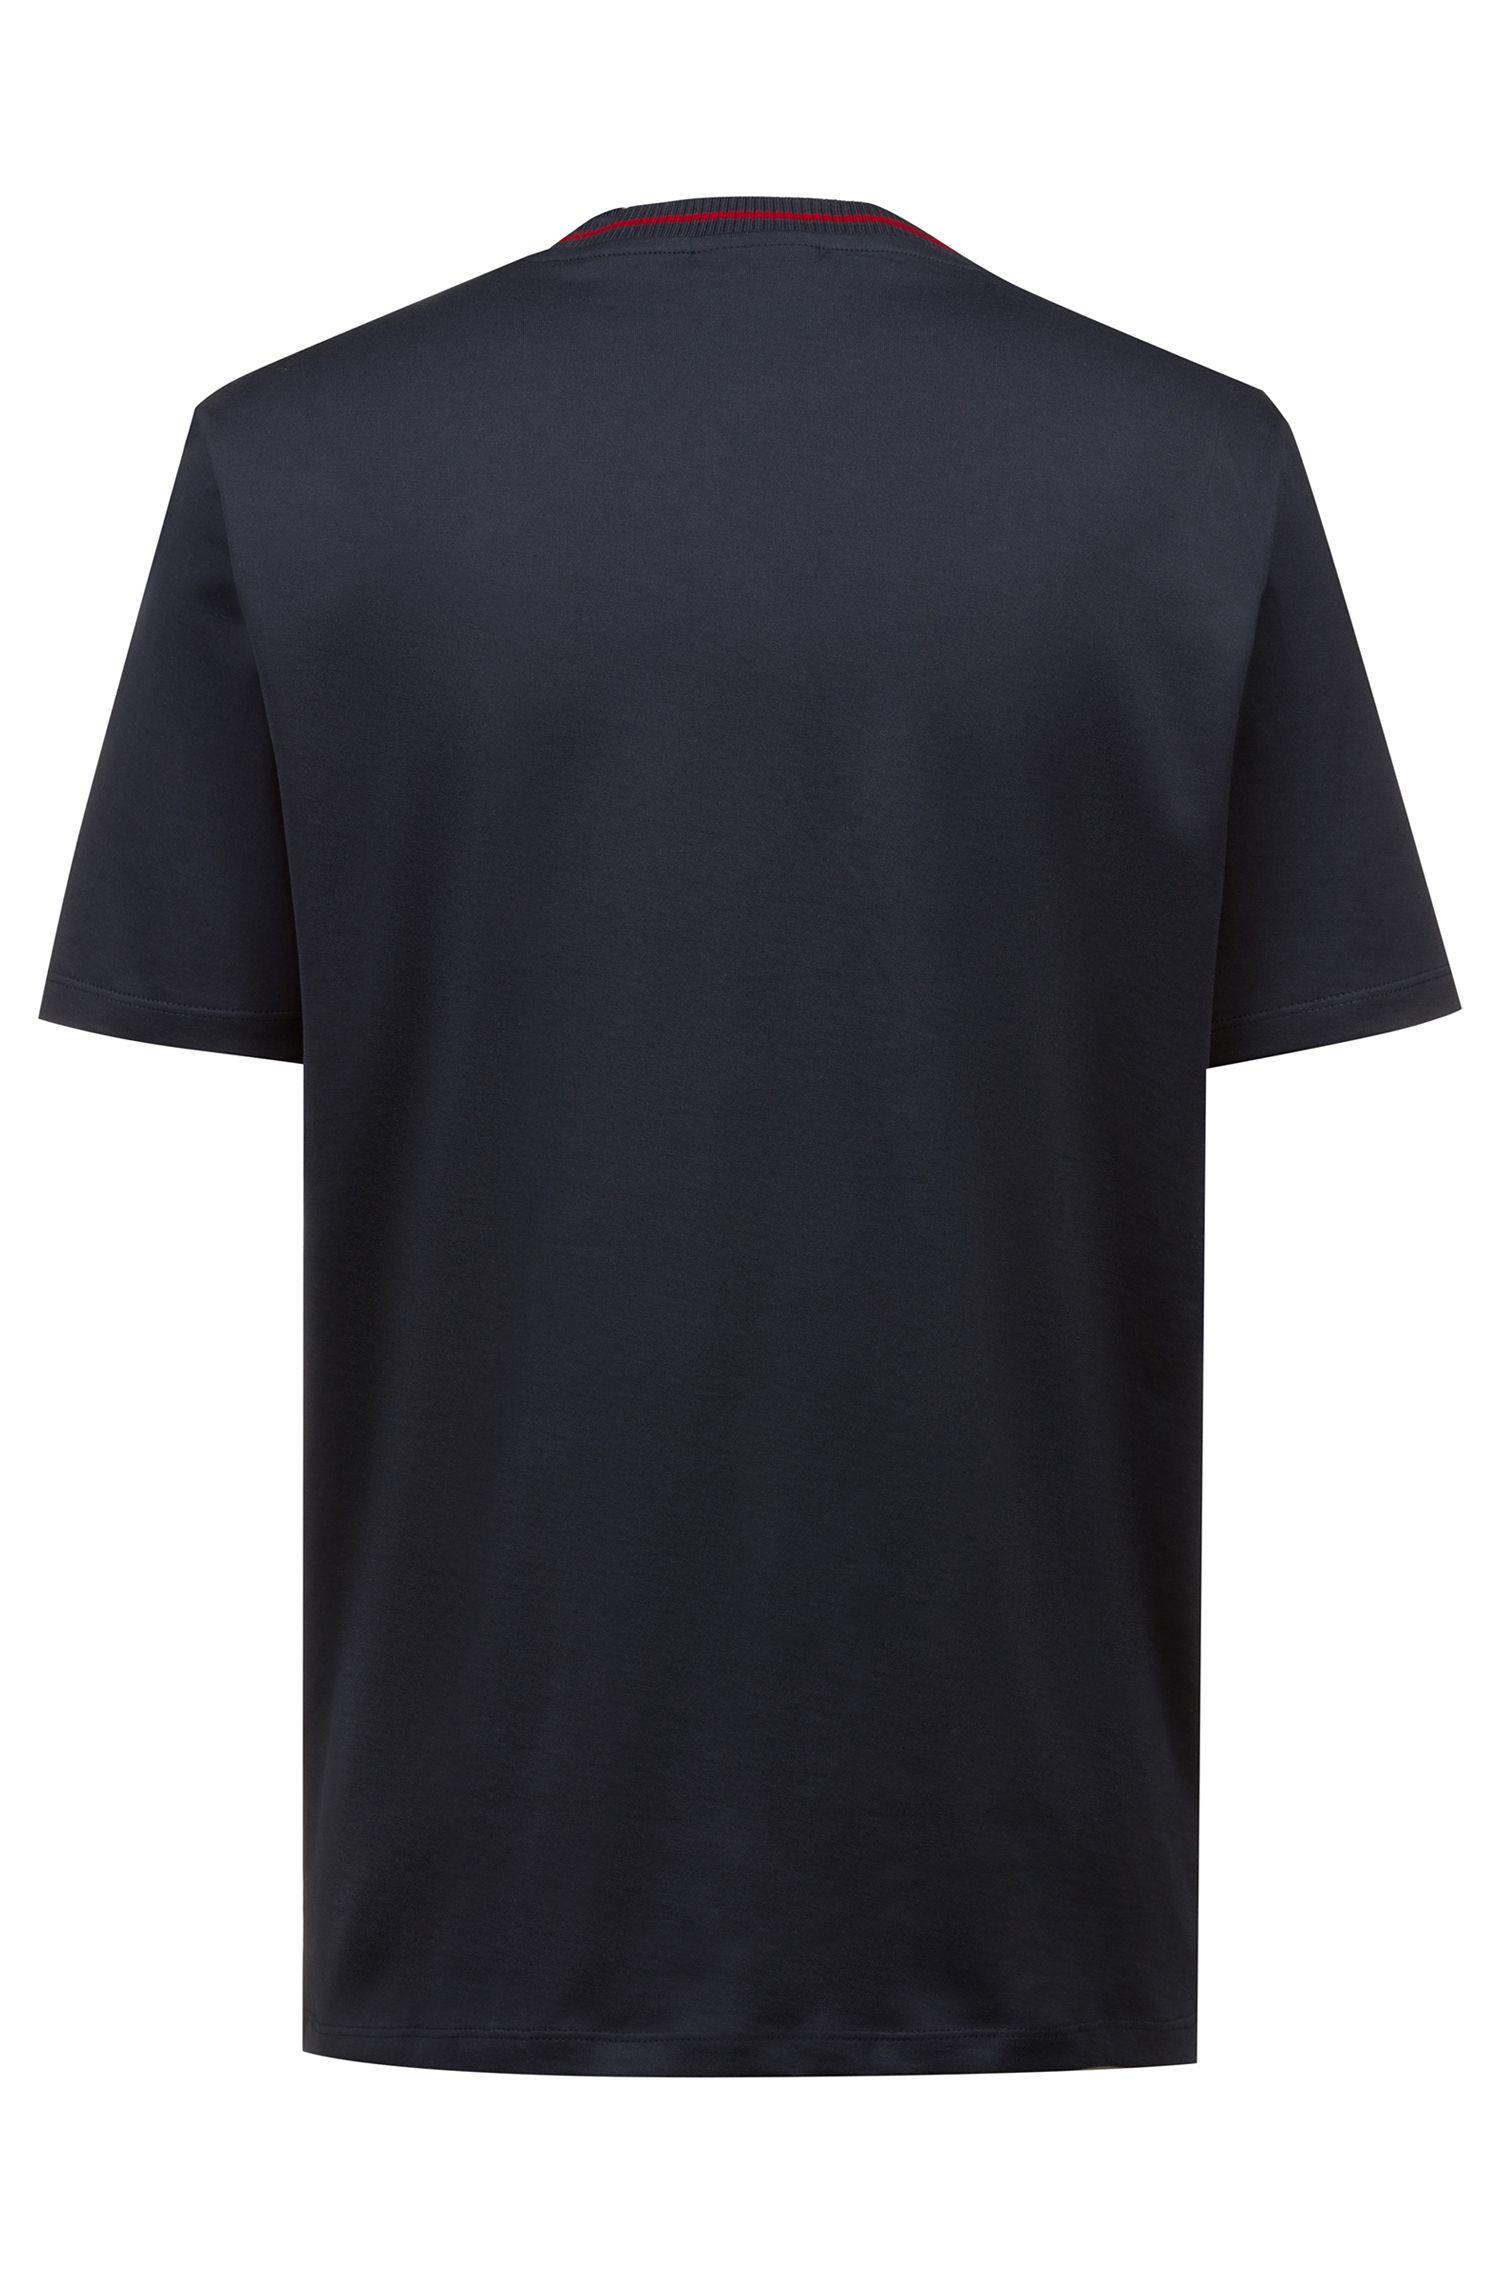 Hugo Boss - Camiseta de algodón con logo parcialmente ocultado - 4